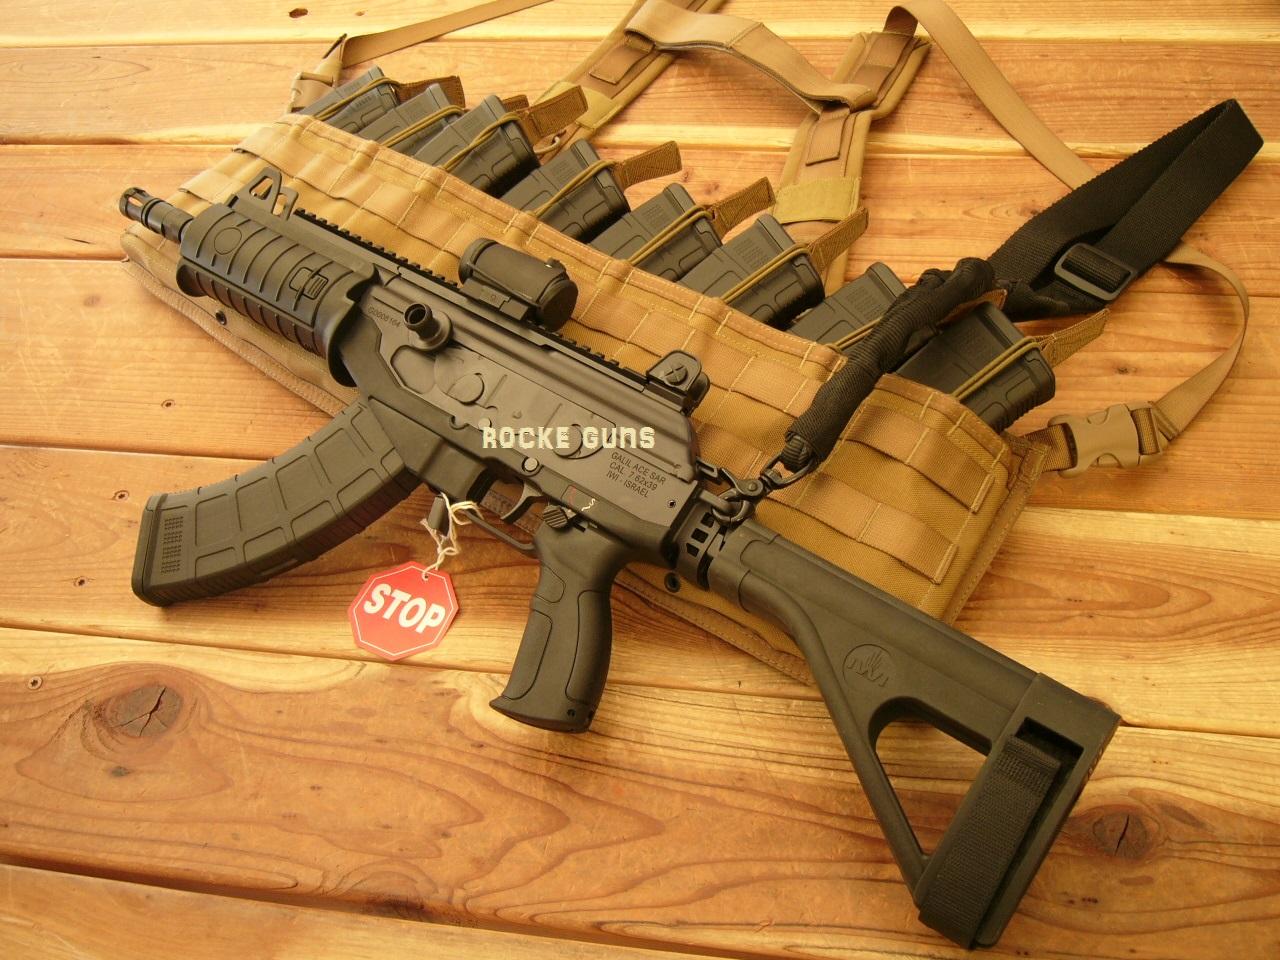 Galil Ace Pistol W Folding Stock 7 62 X 39 Russian